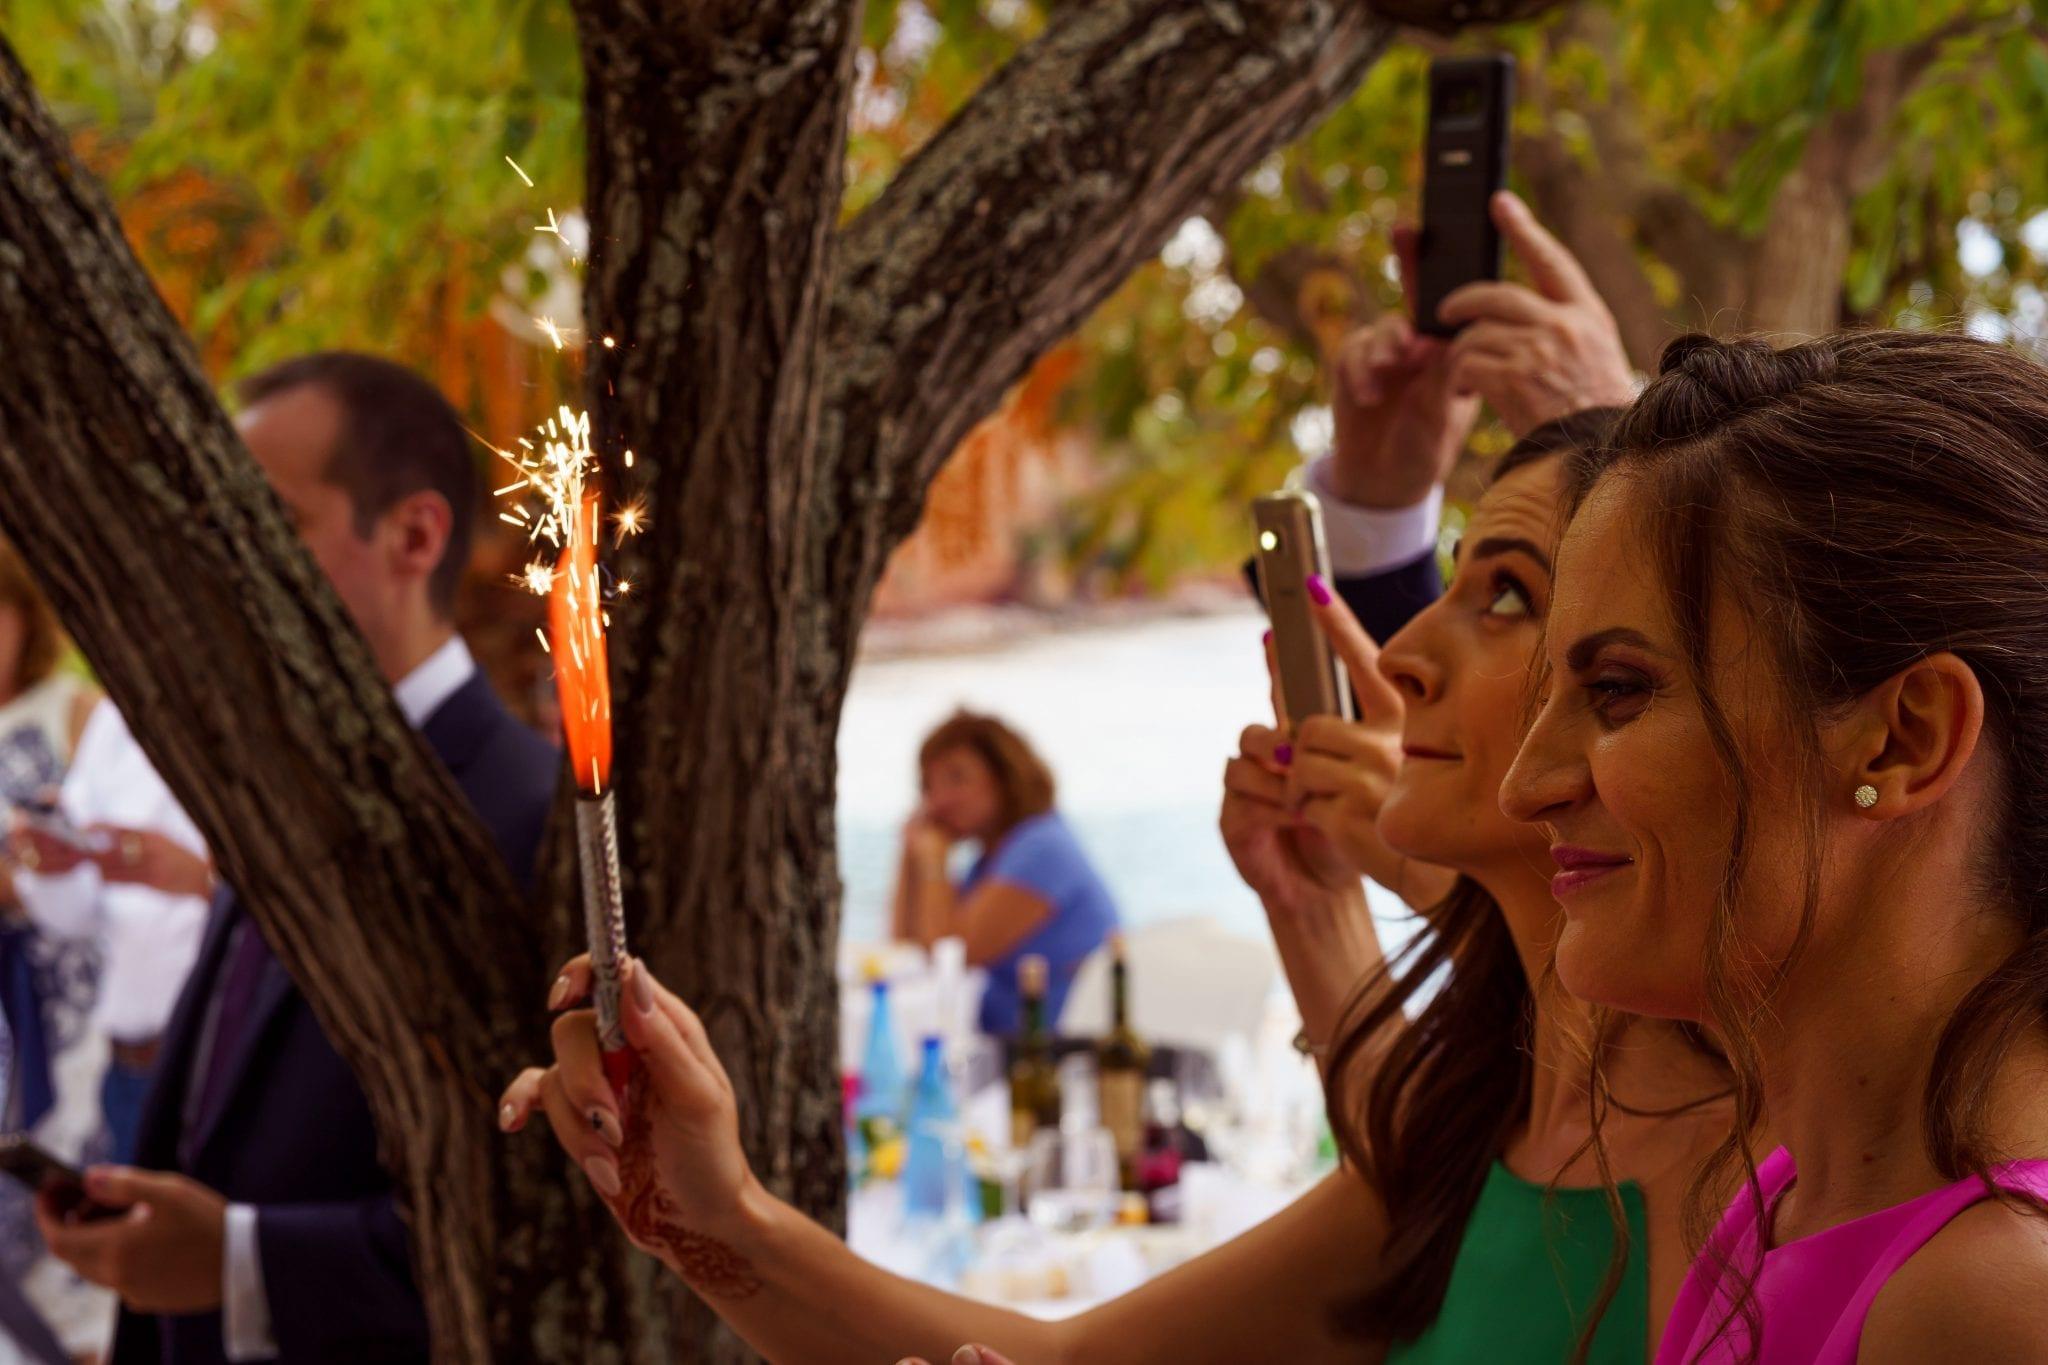 Destination Wedding Photography - Sparklers